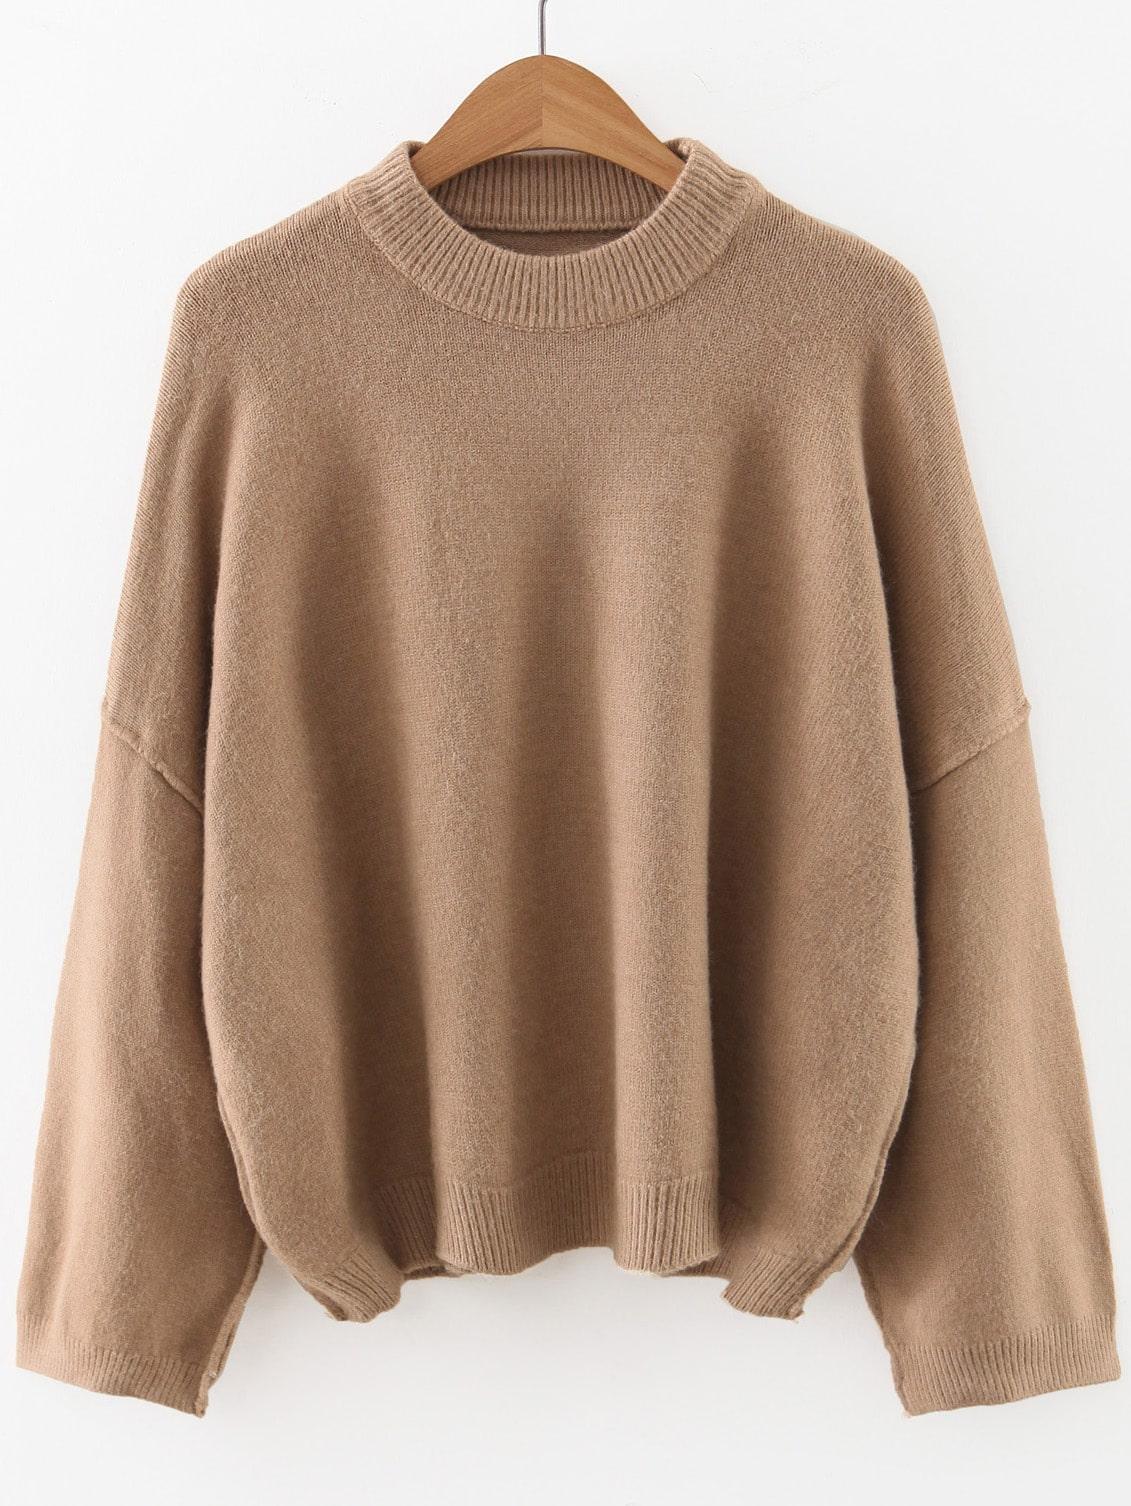 Khaki Crew Neck Drop Shoulder Sweater